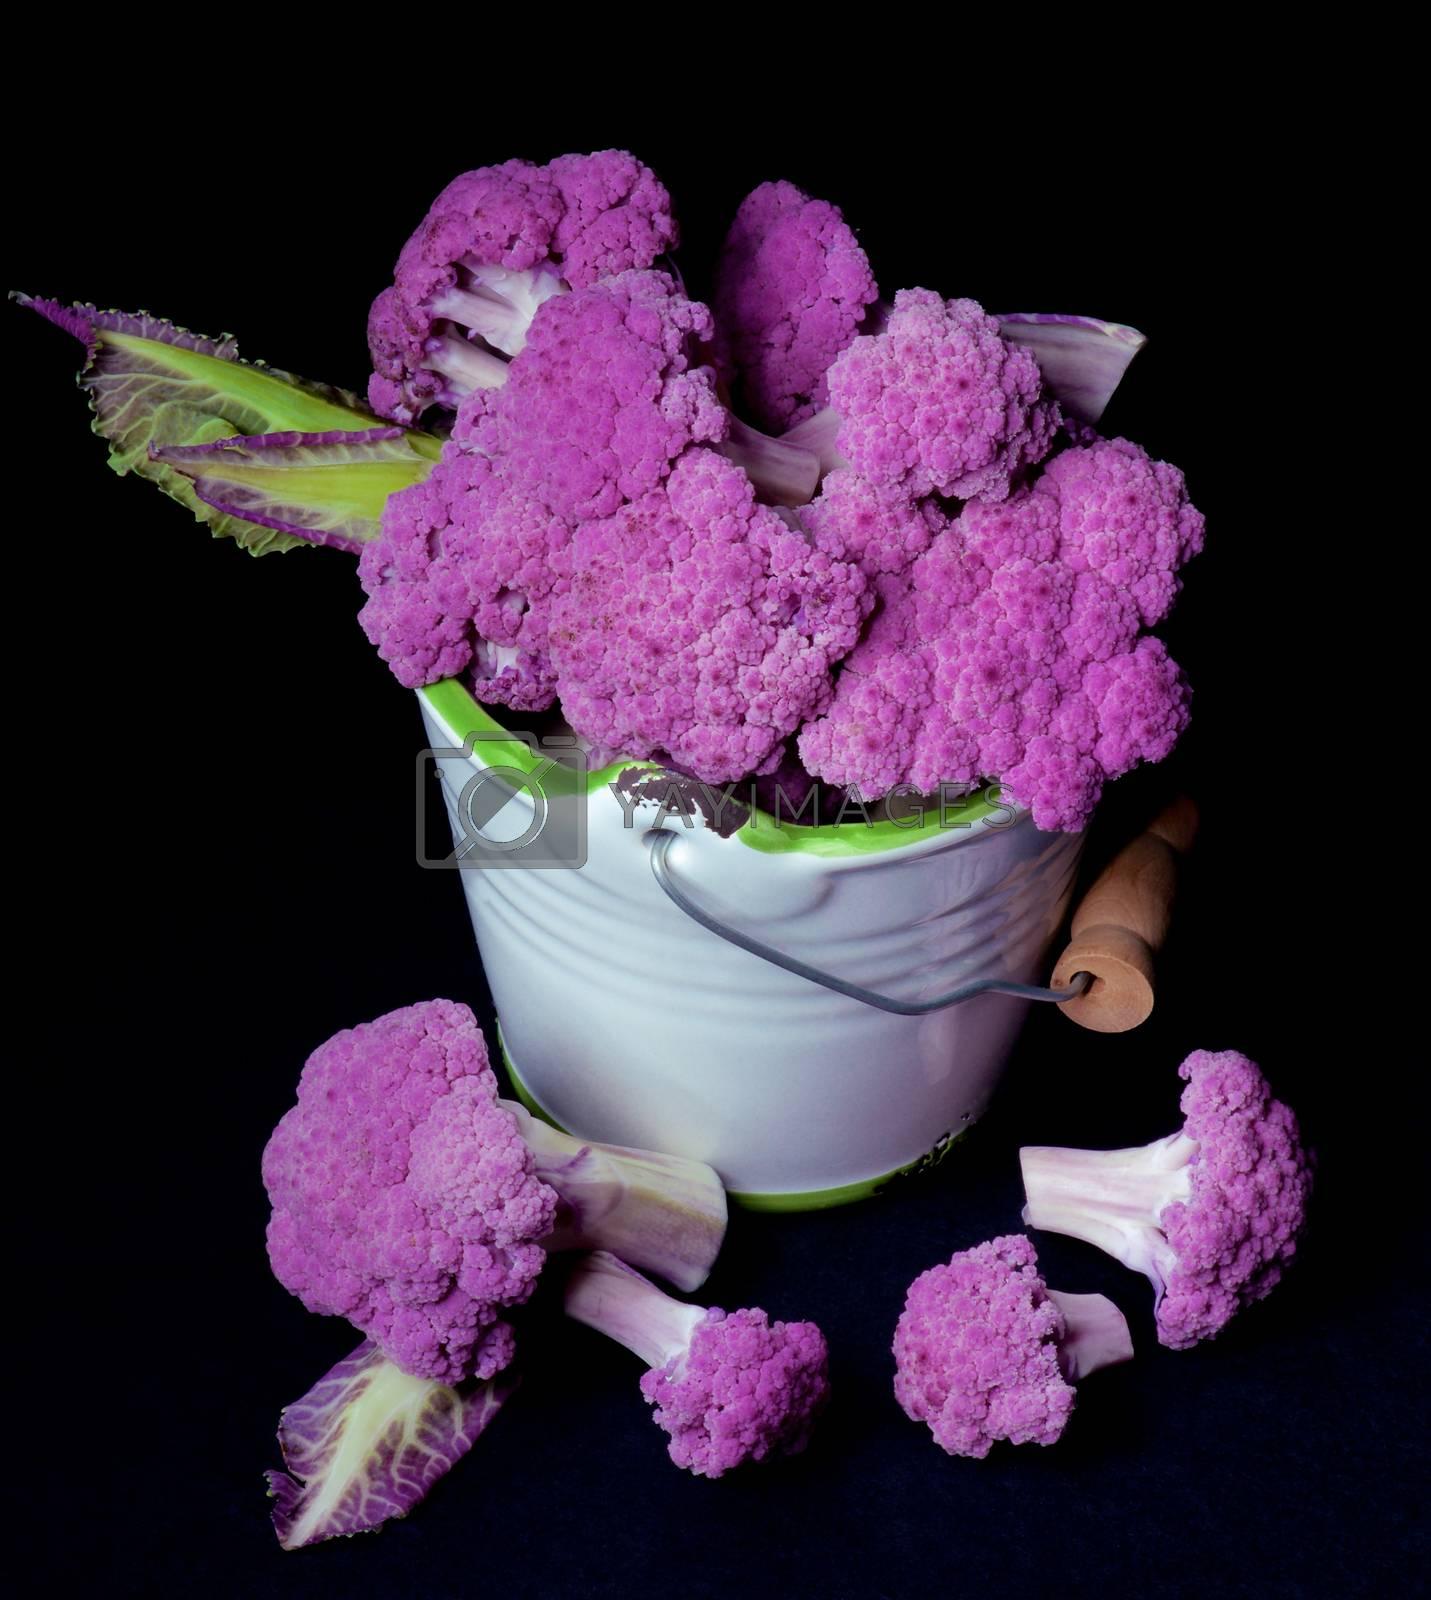 Fresh Purple Cauliflower by zhekos